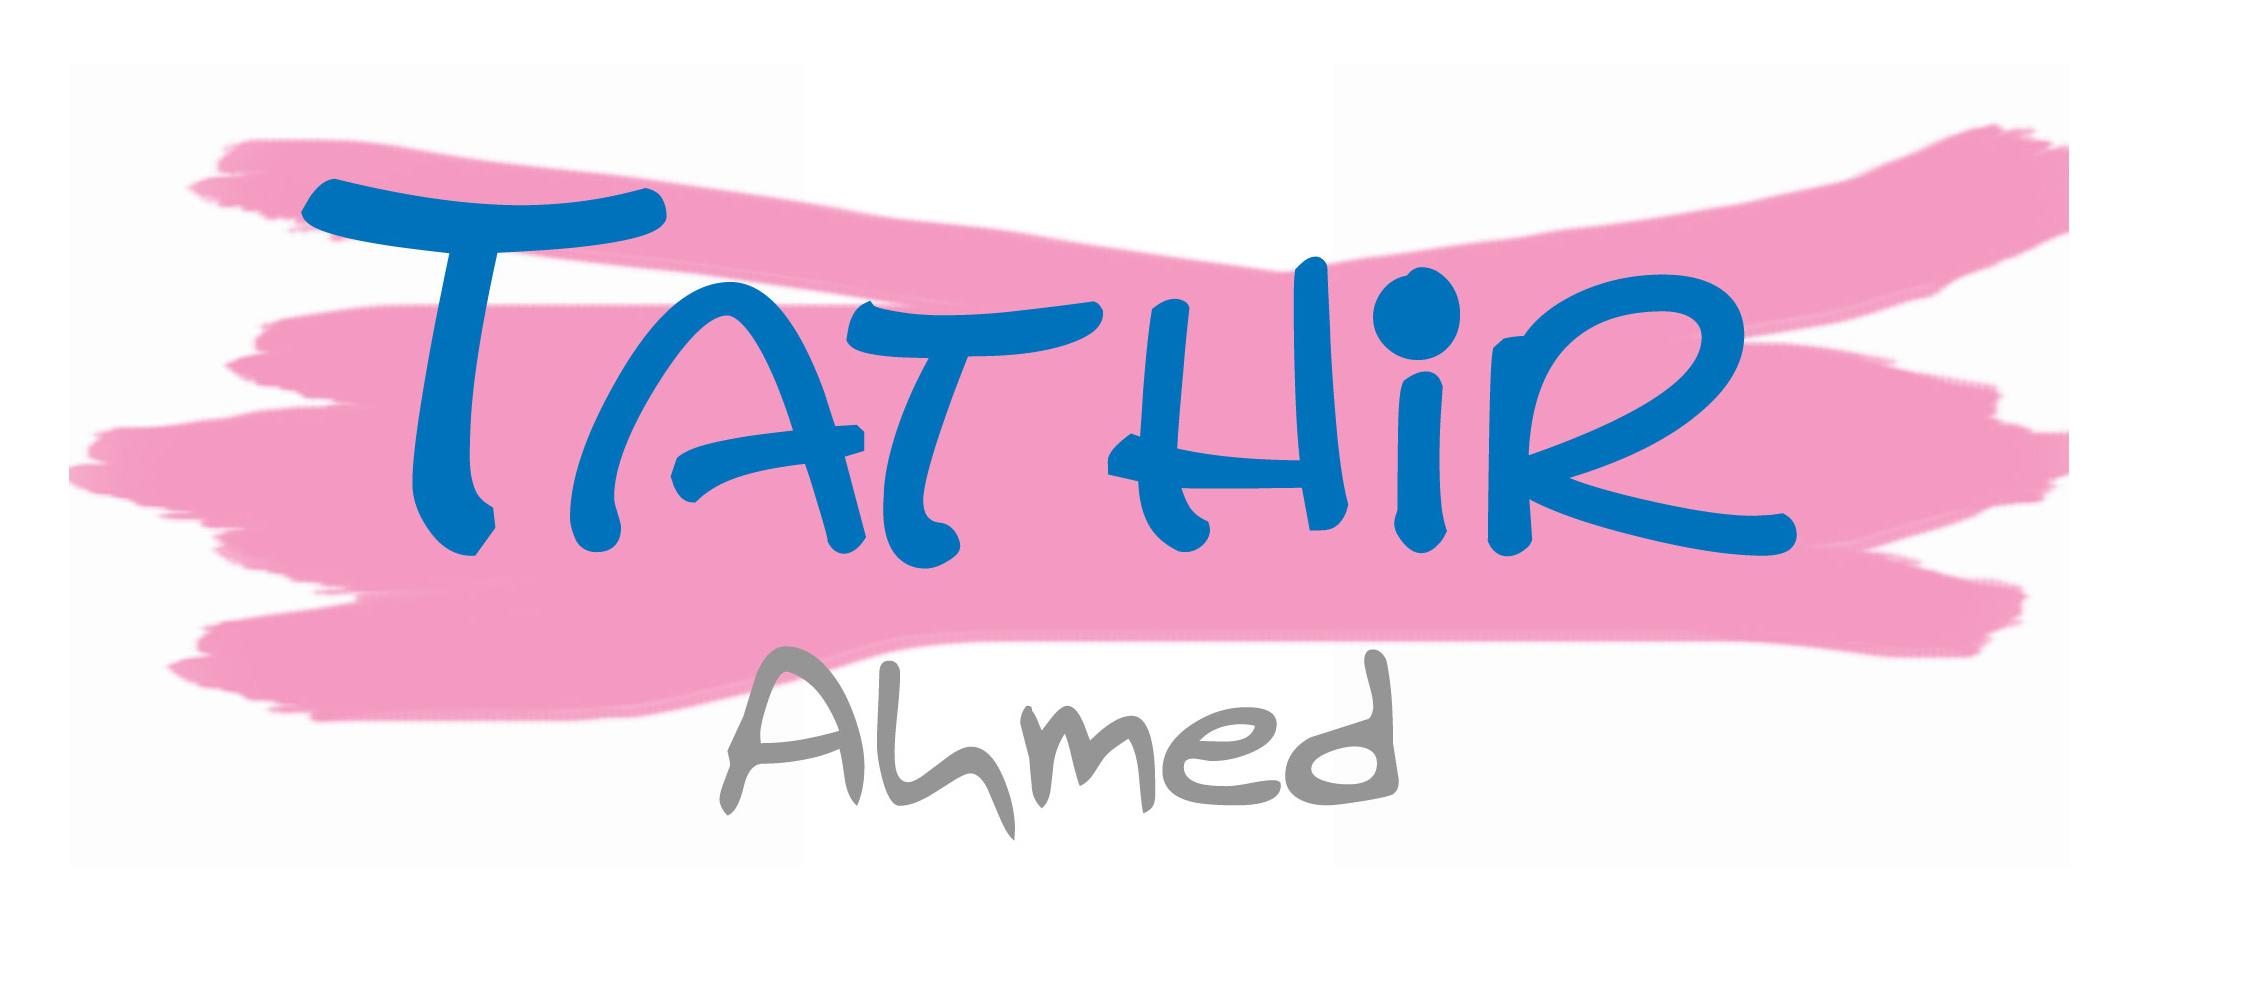 Tathir Ahmed